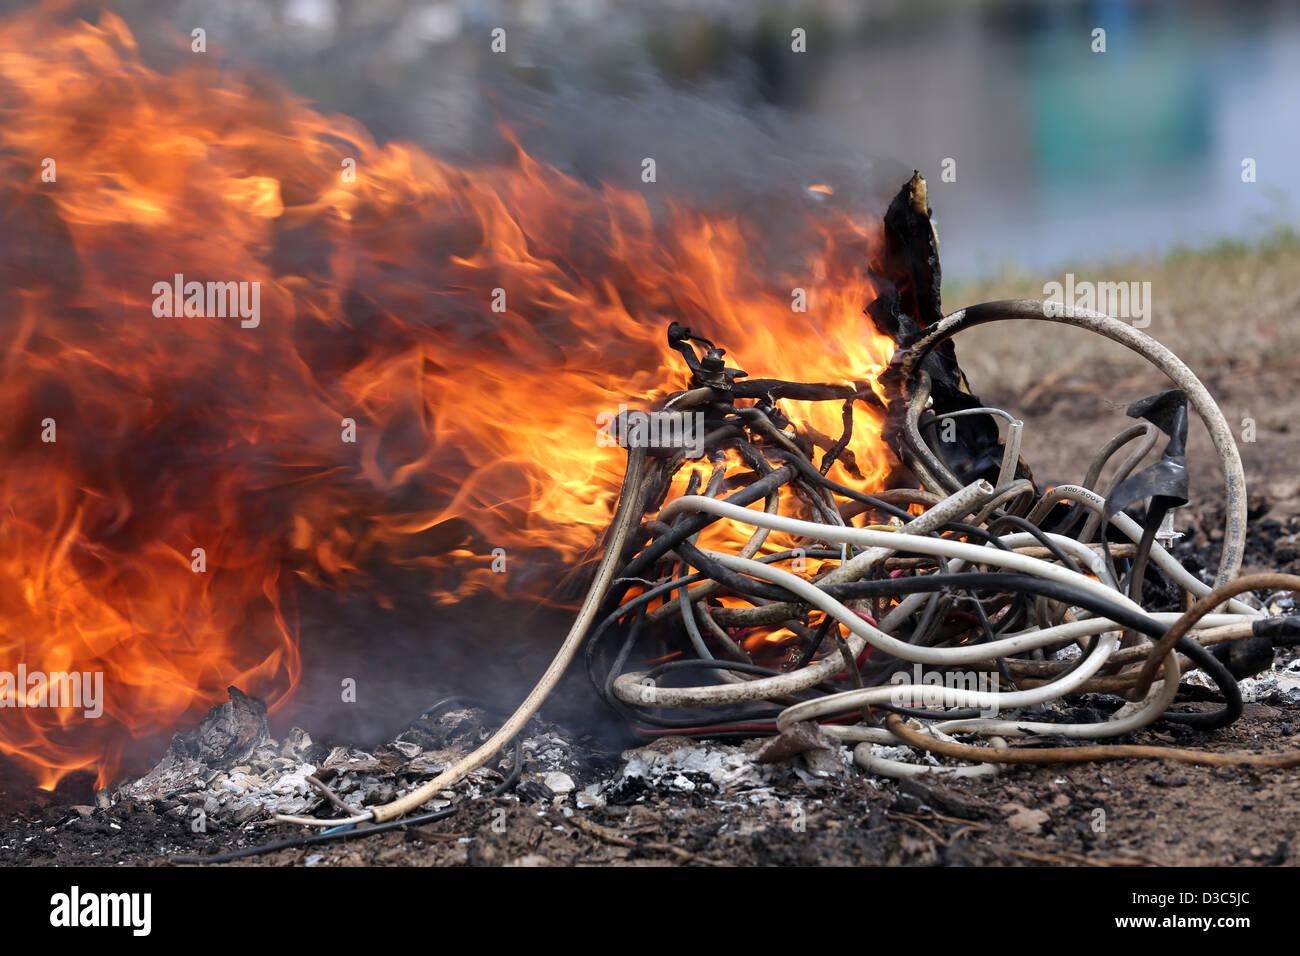 Electronic Waste Africa Stockfotos & Electronic Waste Africa Bilder ...